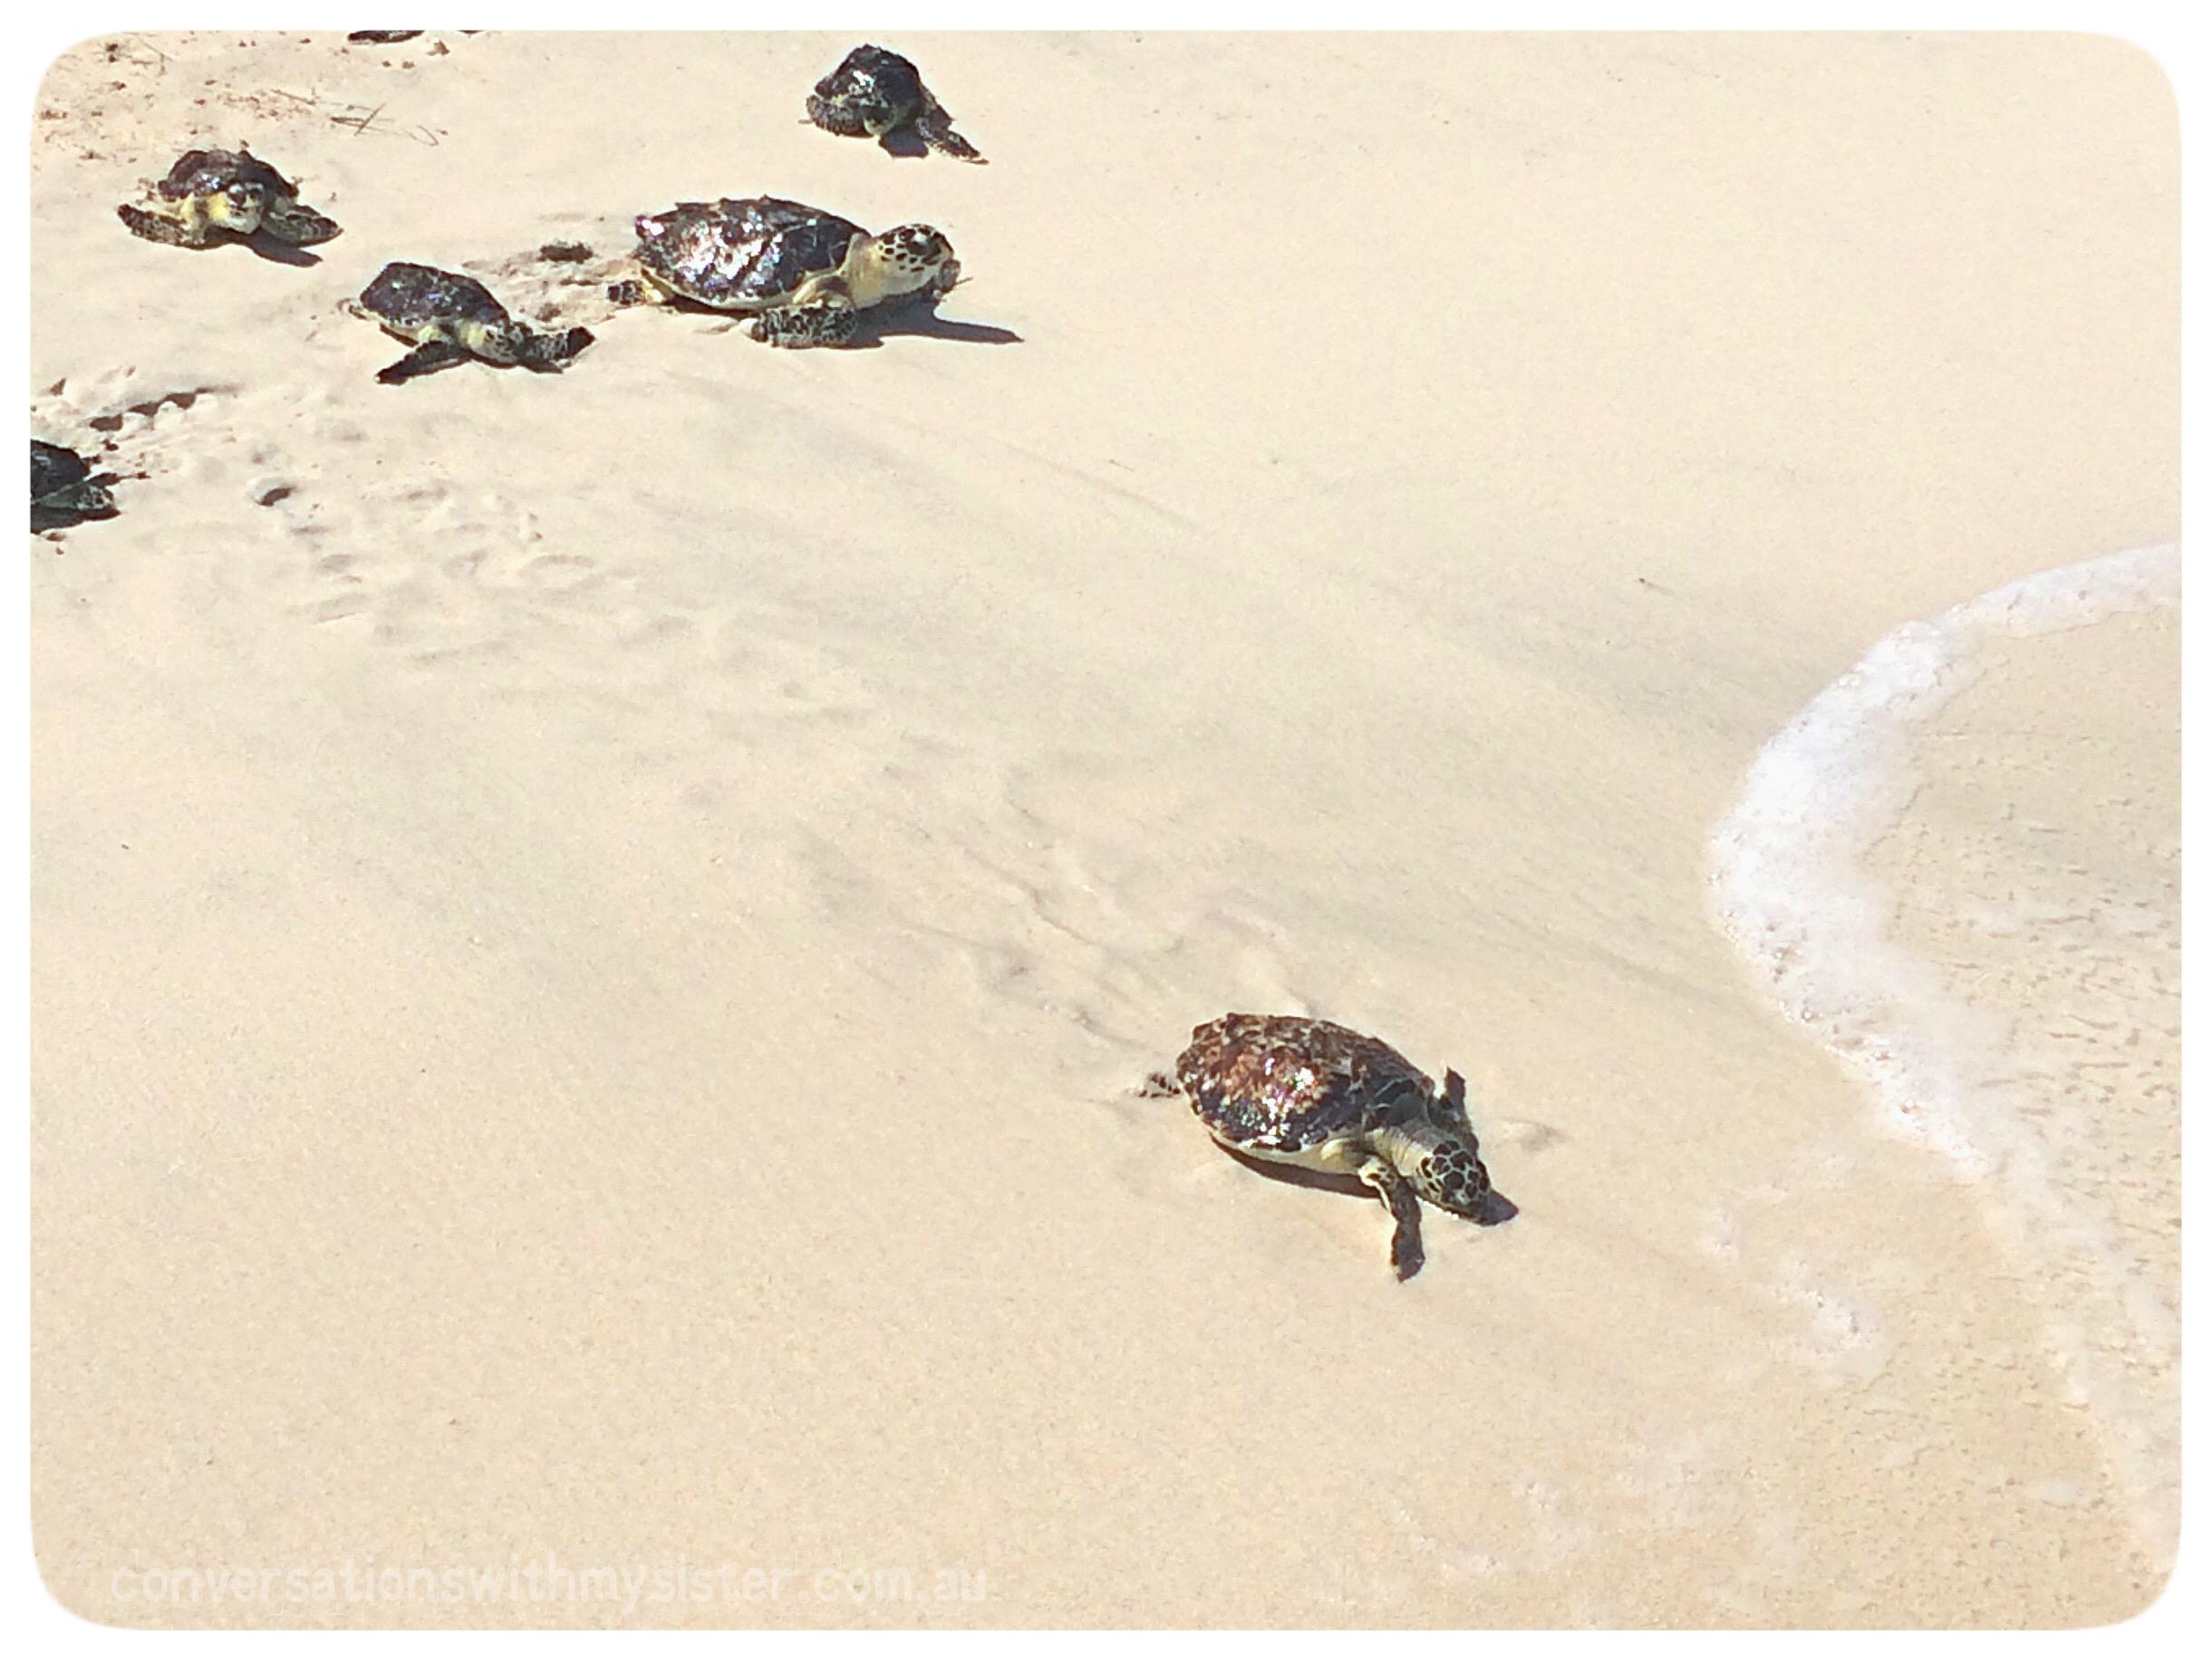 conversationswithmysister.com.au_Turtle Rehabilitation and Release_Saadiyat Island_Abu Dhabi